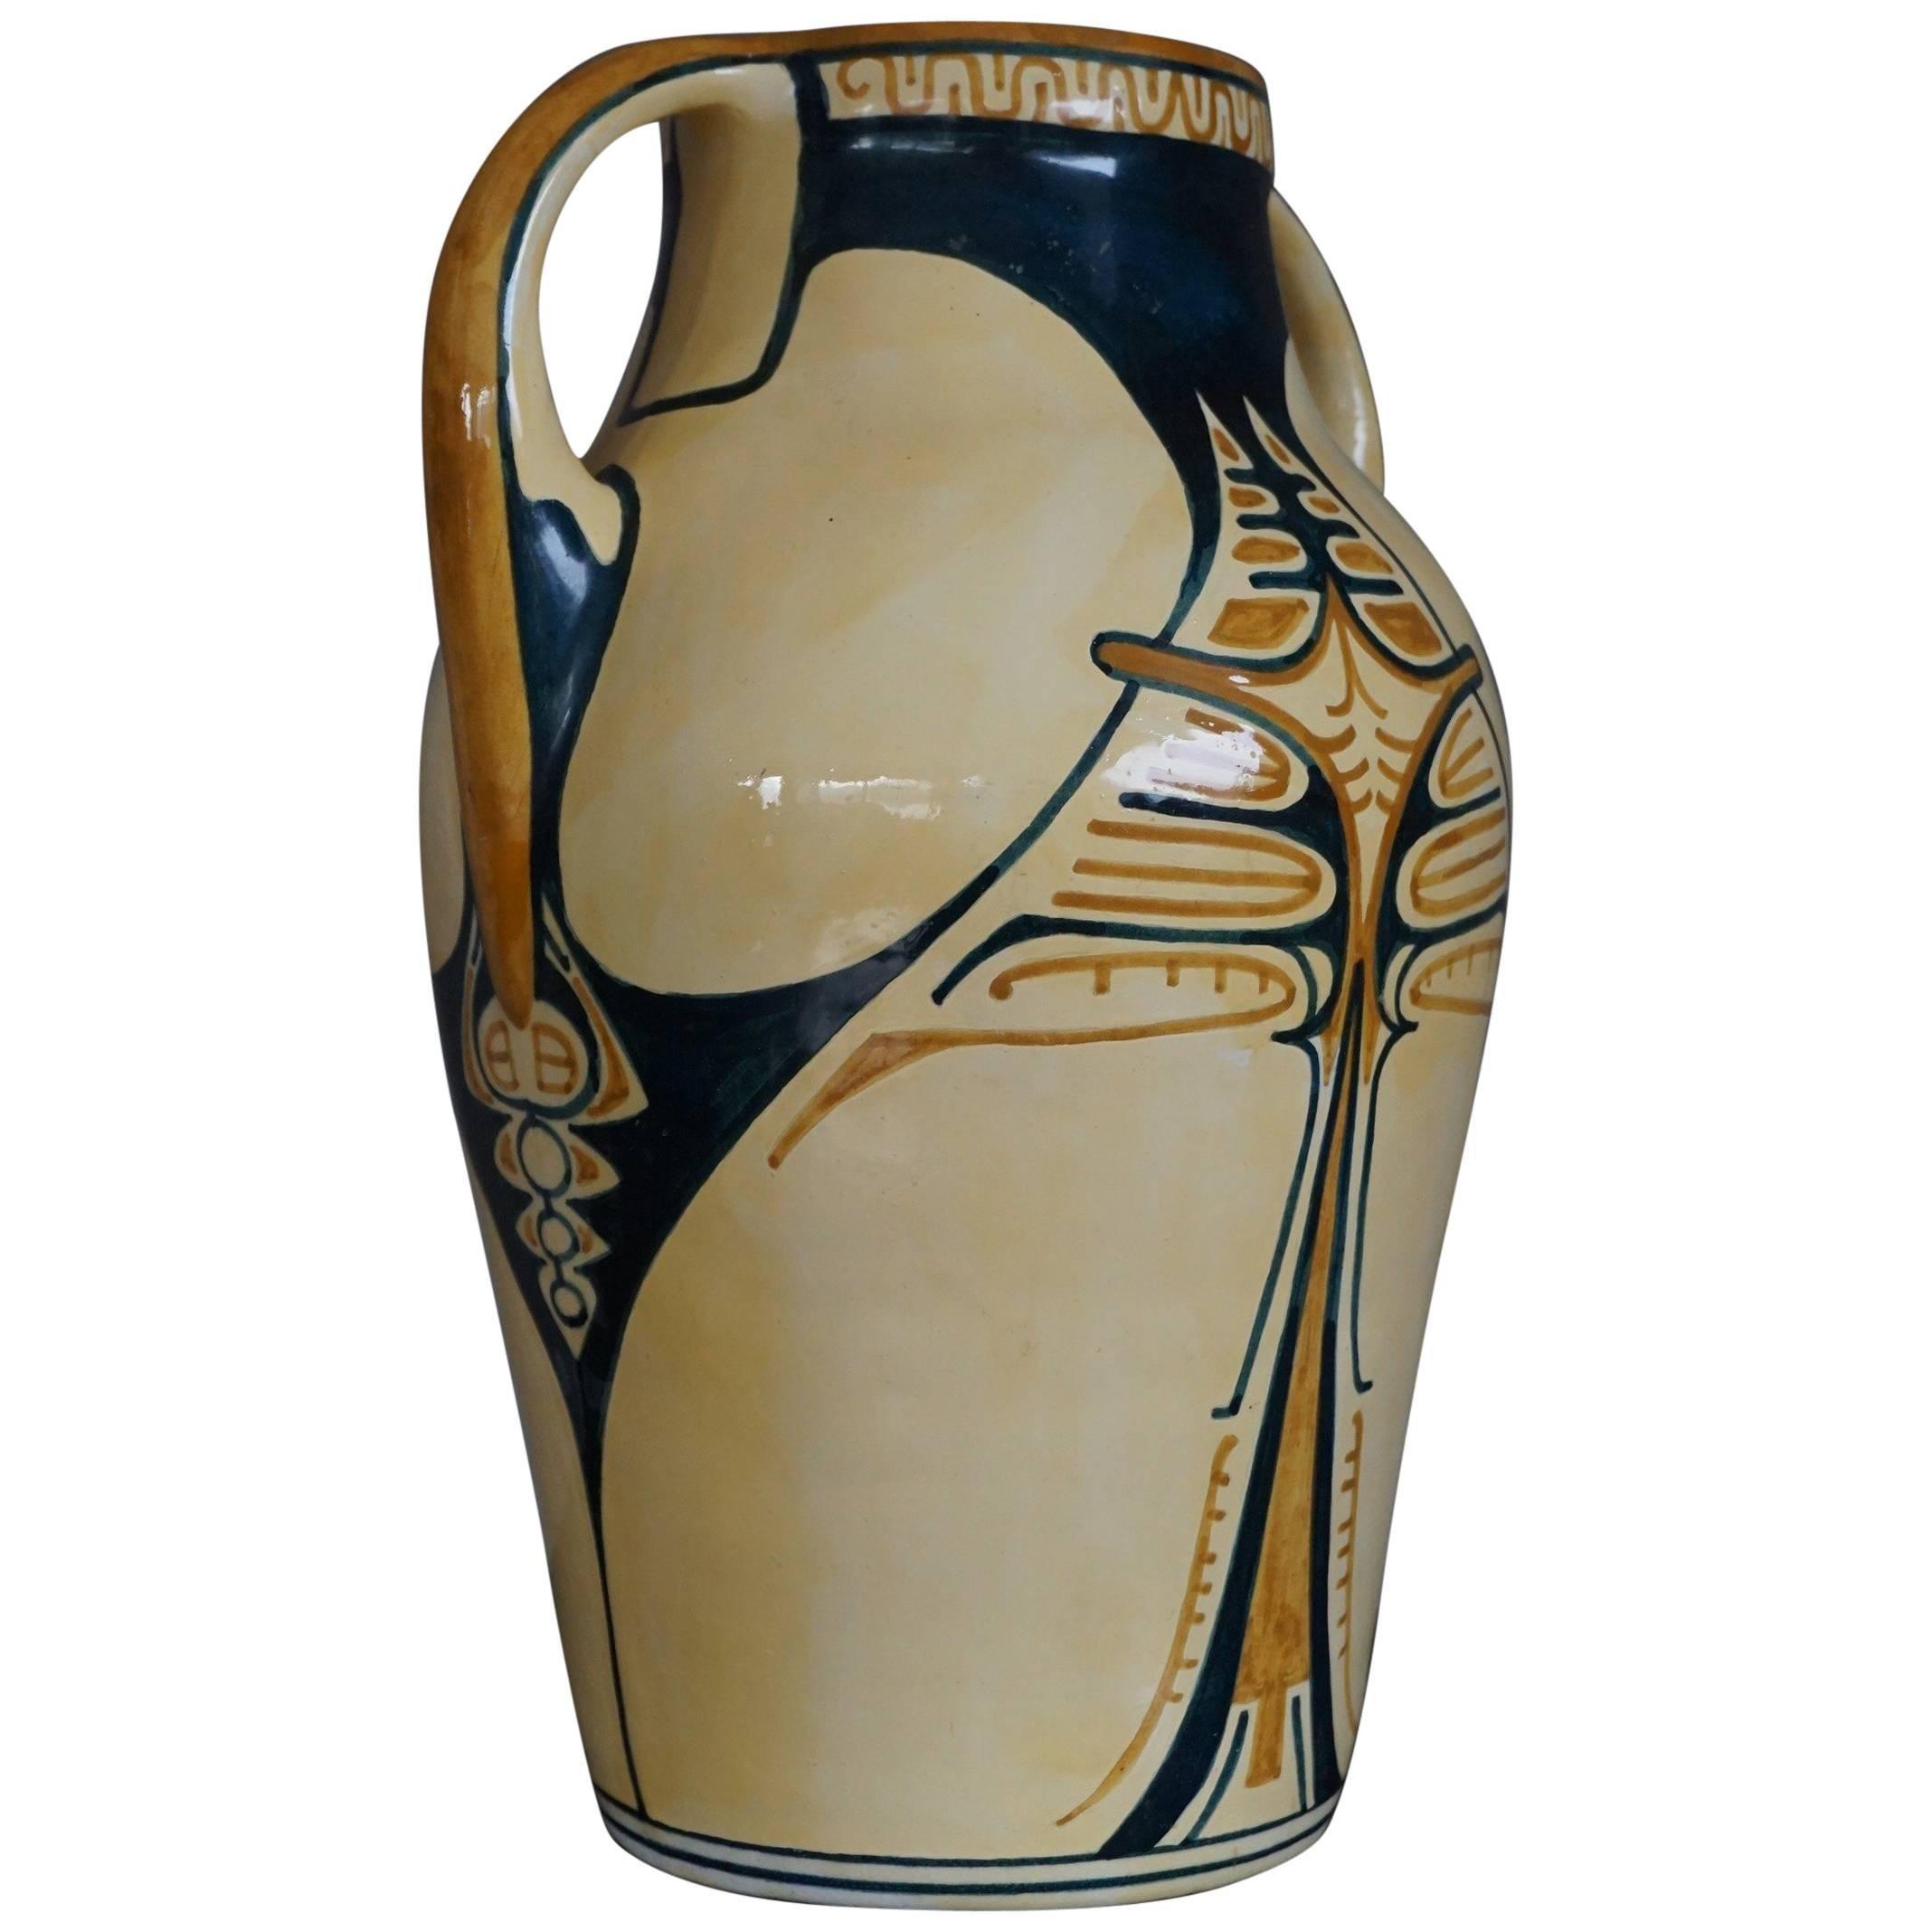 Antique and Hand-Painted Dutch Arts & Crafts DKP Dordtsche Kunst Pottery Vase